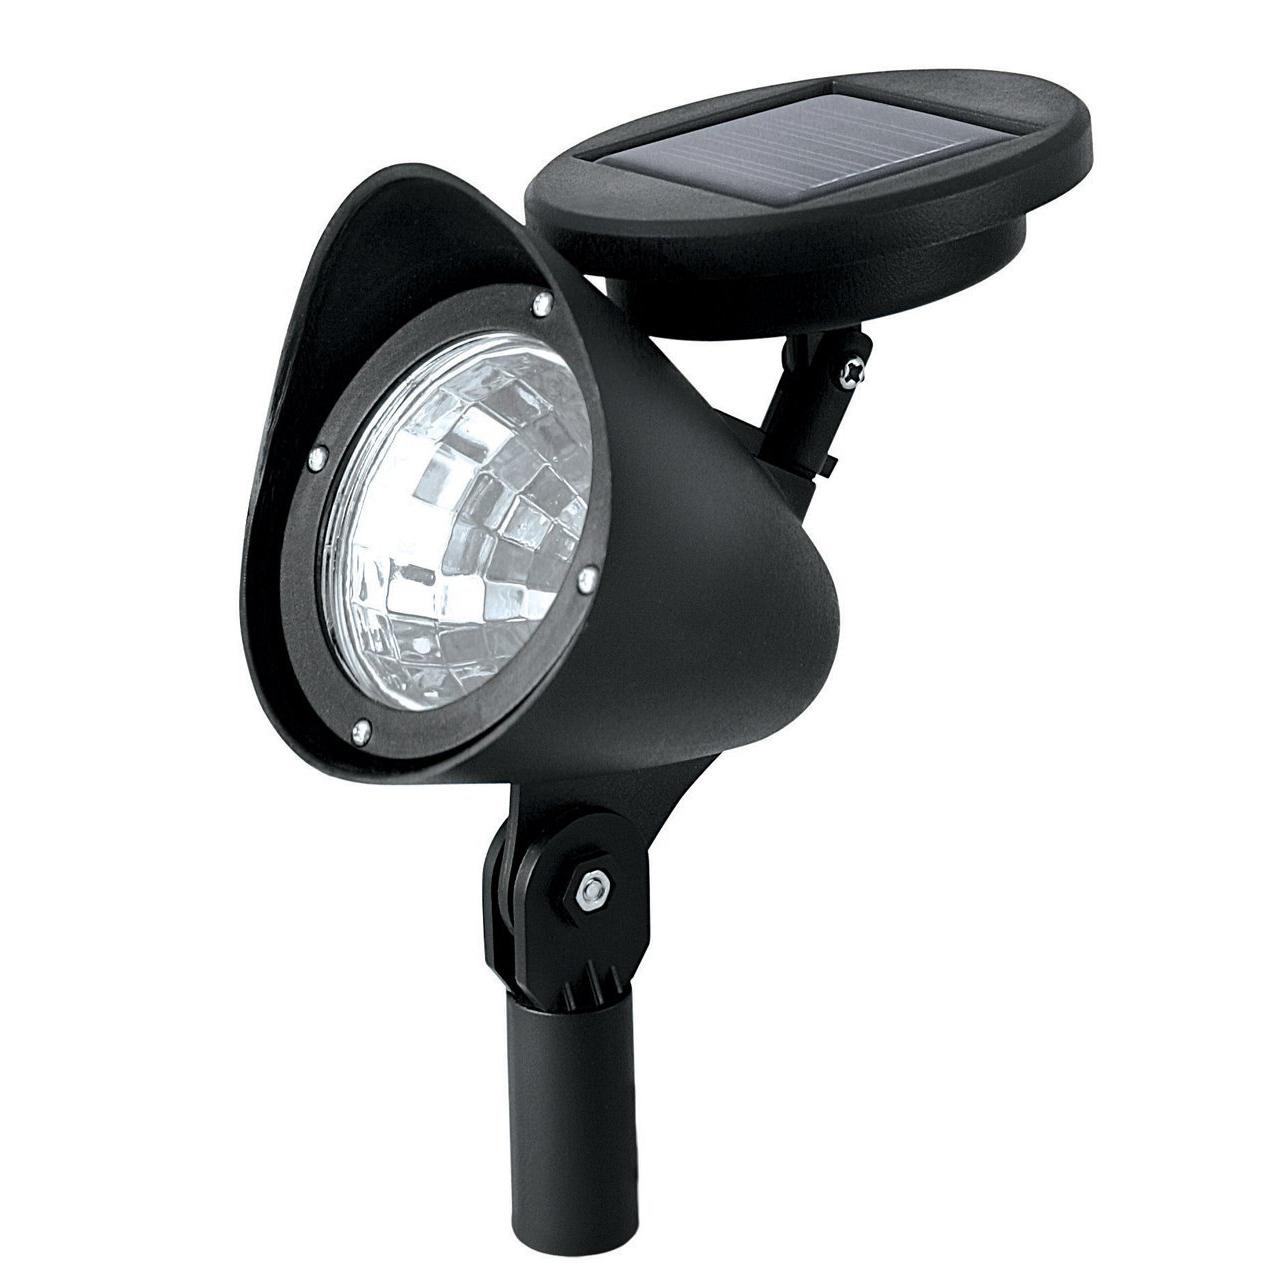 THGS Outdoor Solar Powered LED Spotlight Garden Pool Waterproof Spot Light Lamp(China (Mainland))